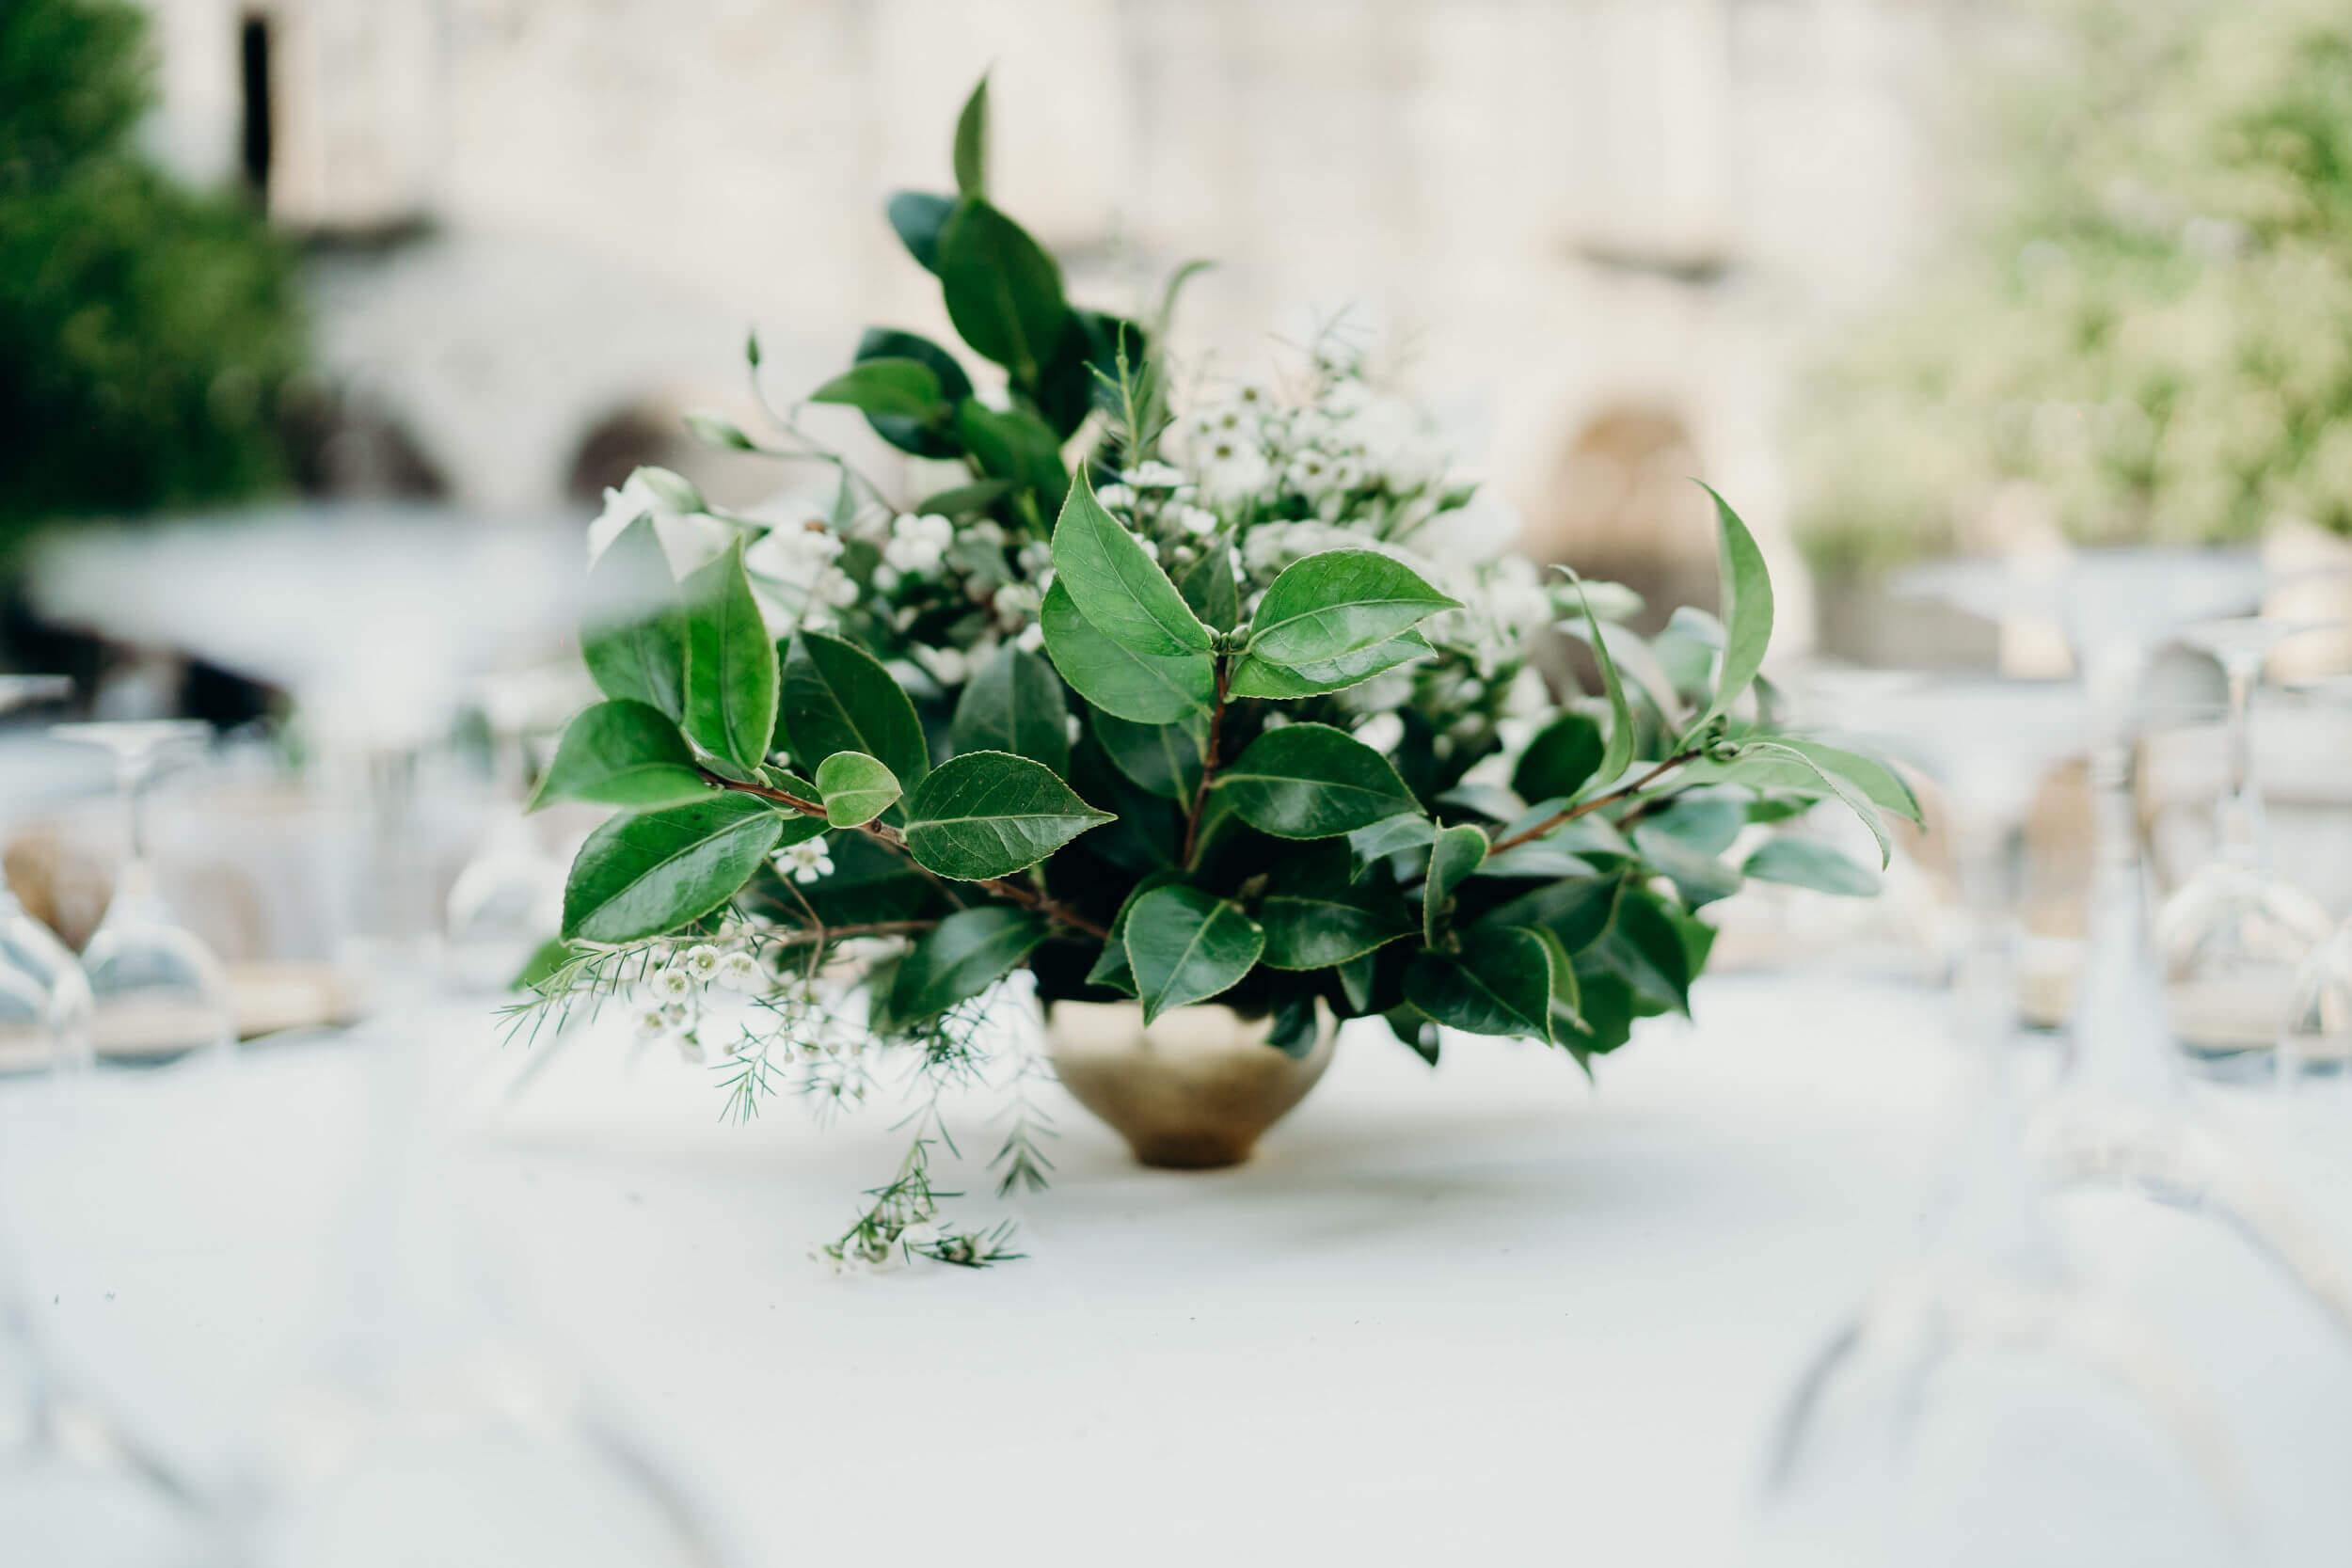 roma-organizacao-eventos-casamento-ana-e-pedro-21